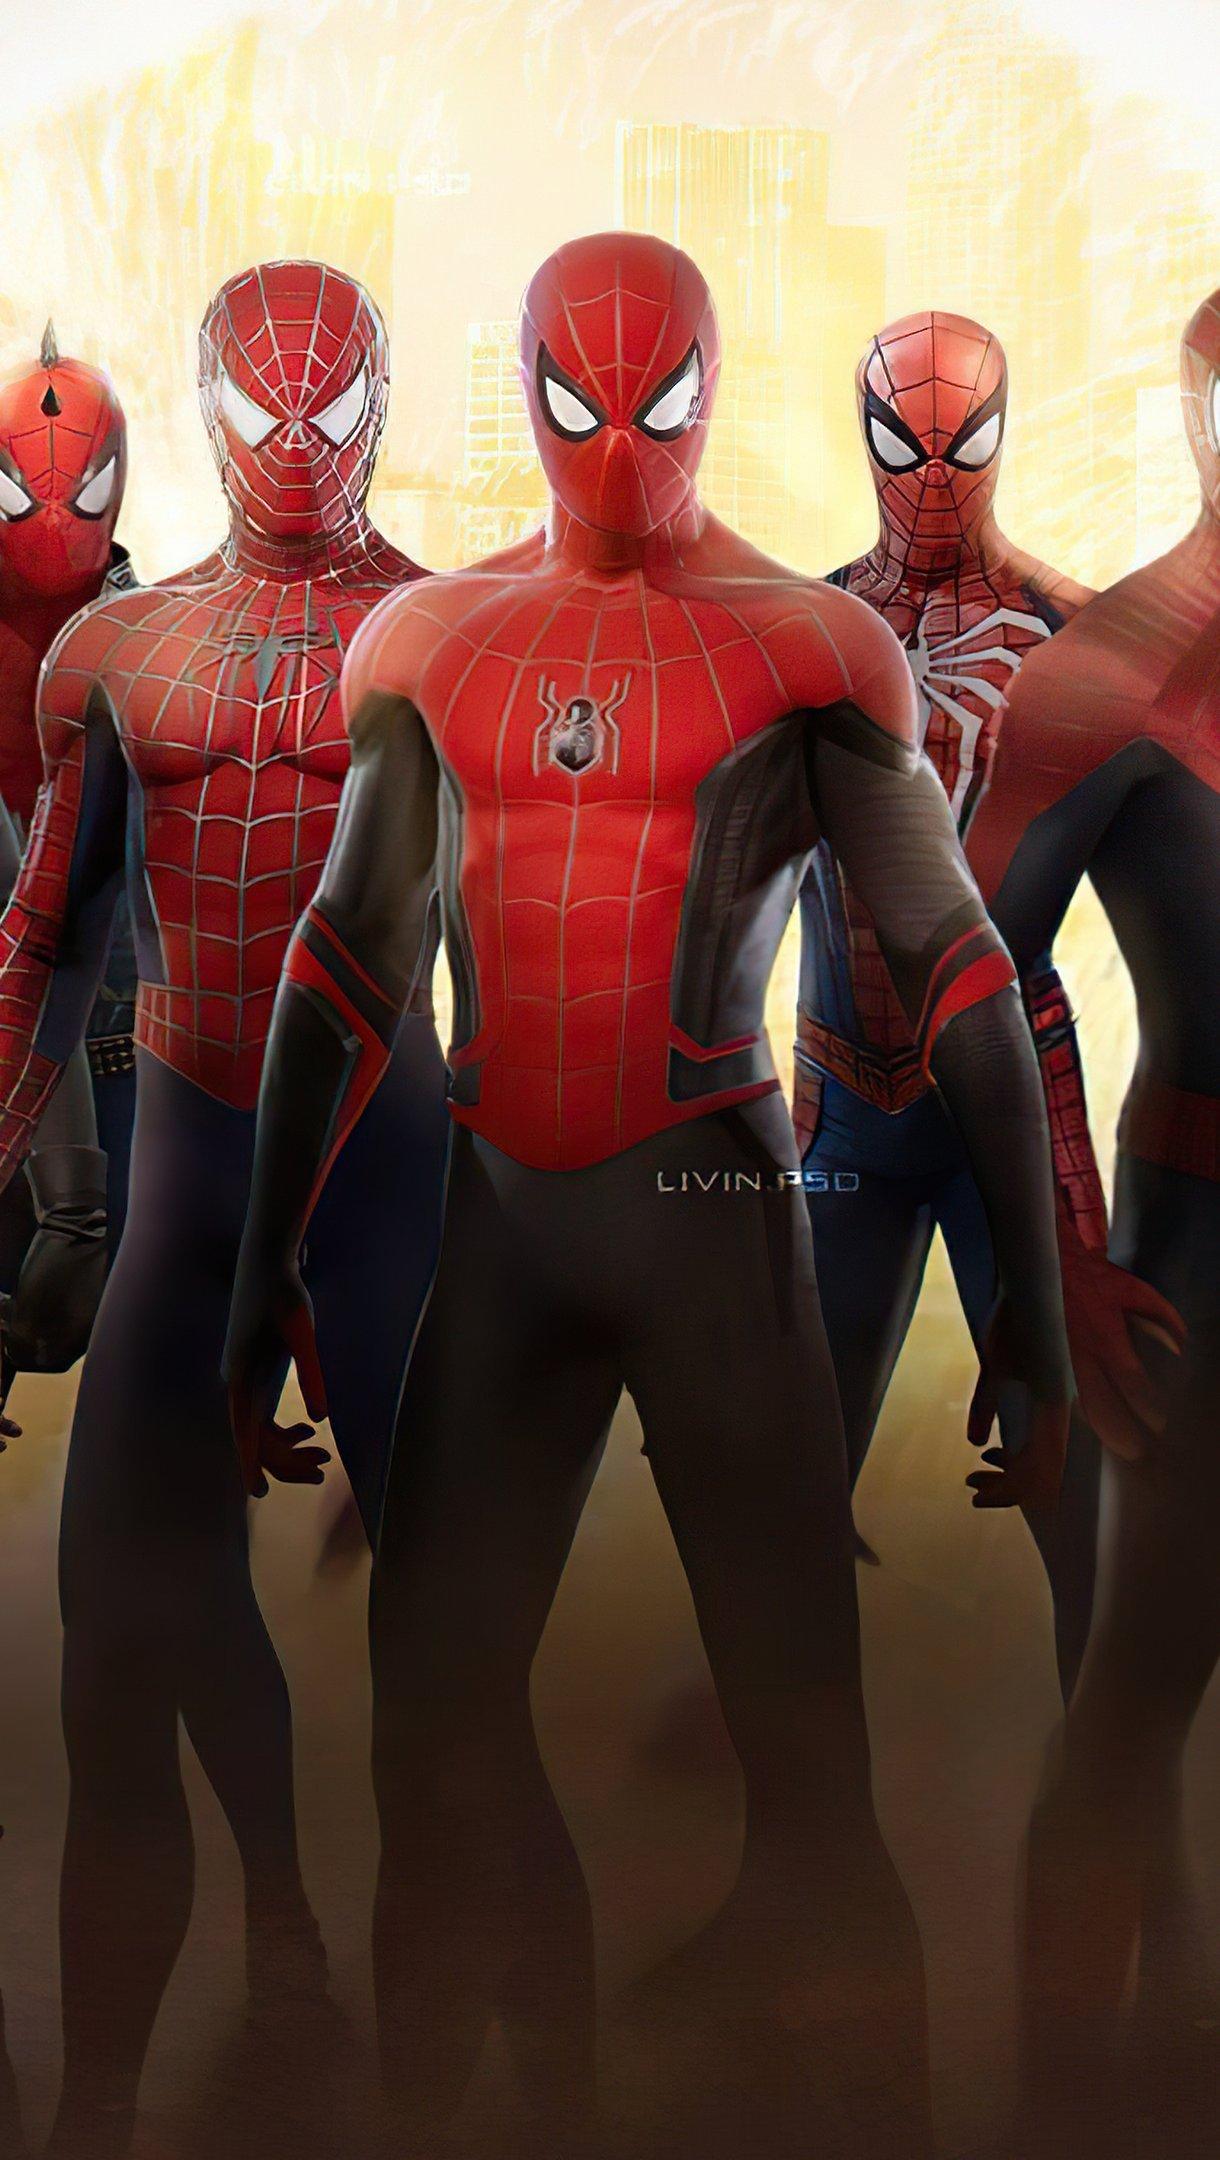 Wallpaper Spider Verse Vertical